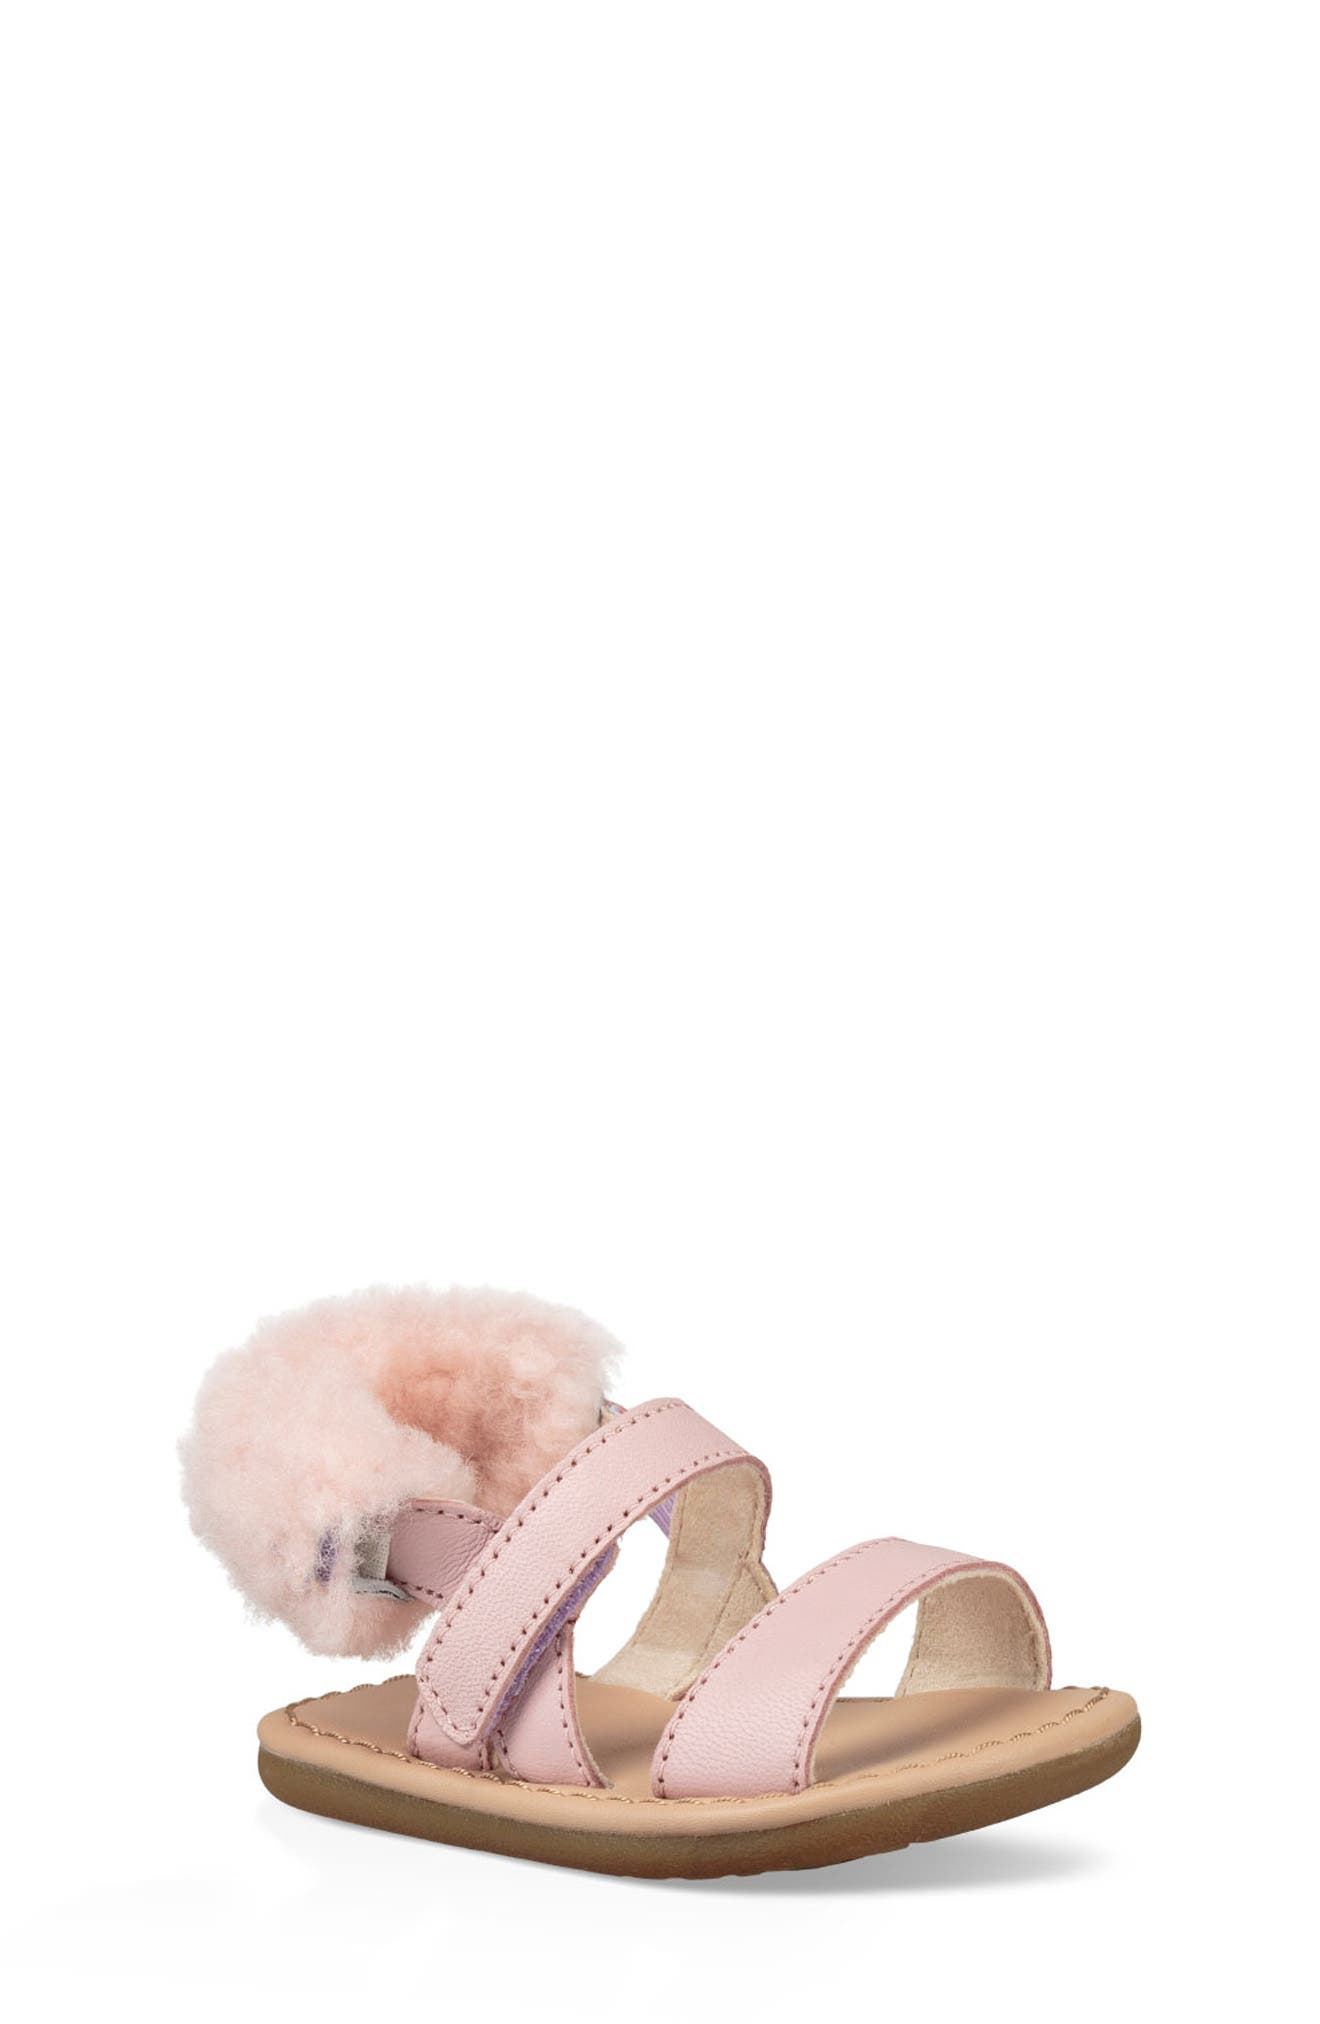 Dorien Genuine Shearling Trim Sandal,                             Main thumbnail 1, color,                             PETAL